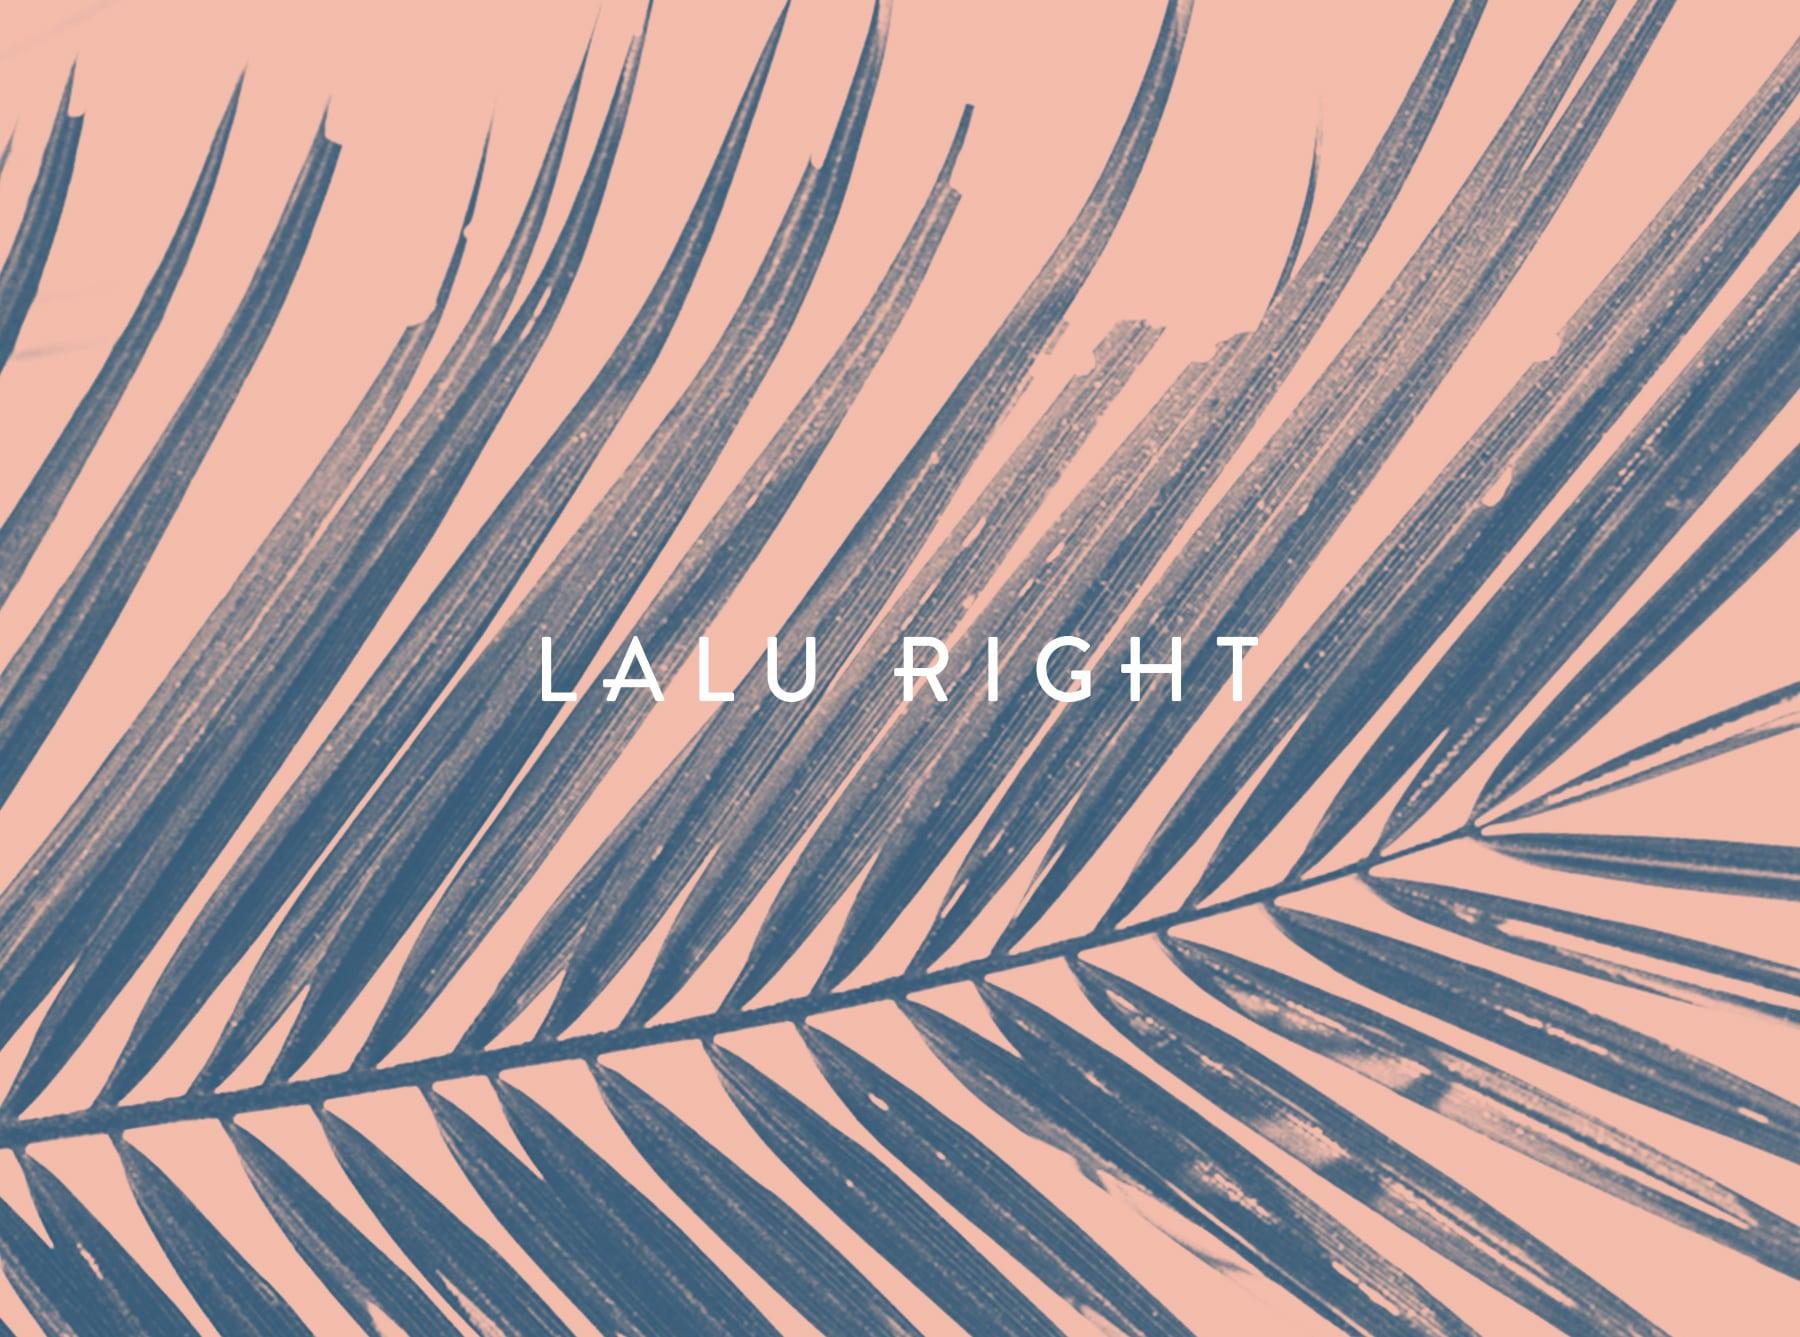 LALU-Right-logo-sampler-Kinlake-04